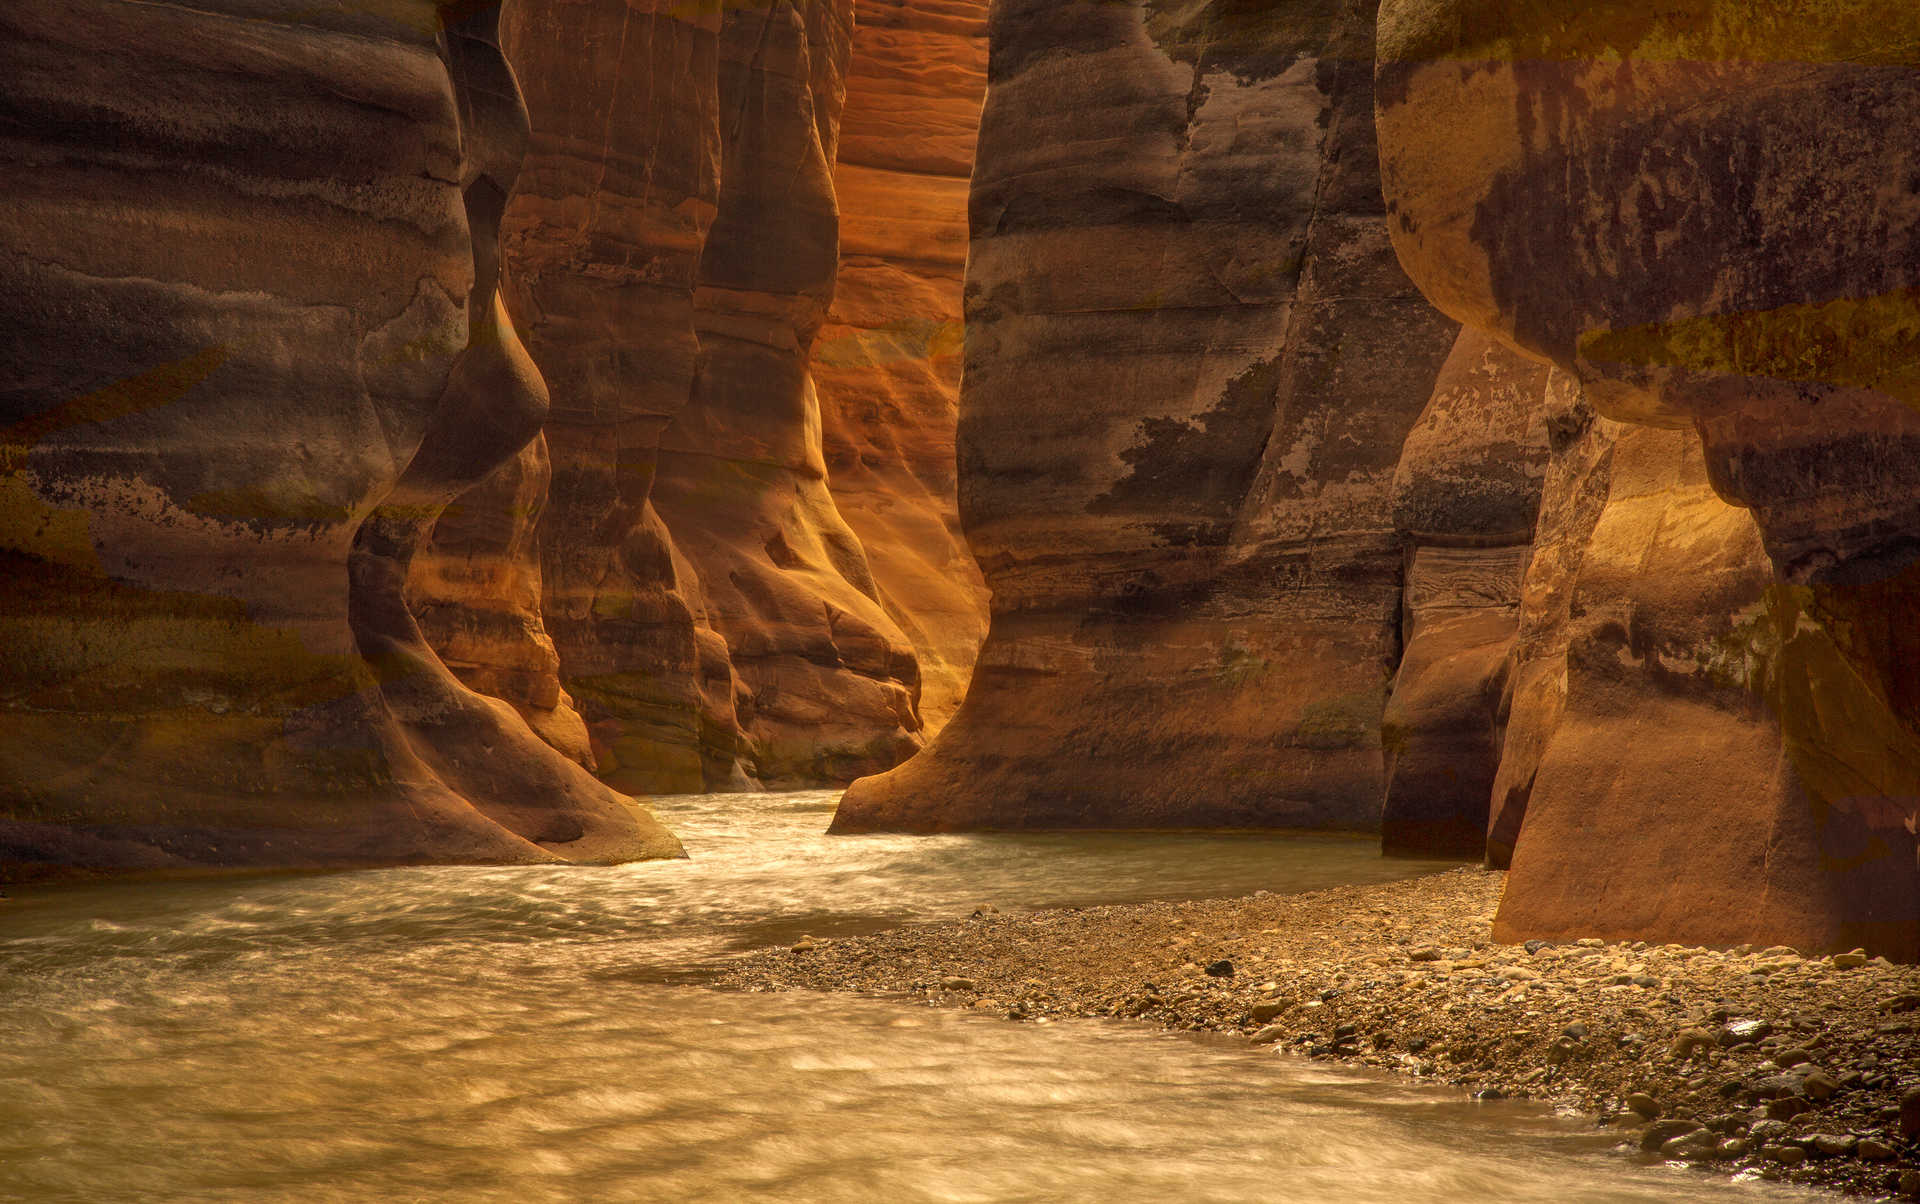 Water flowing through a deep canyon in Jordan